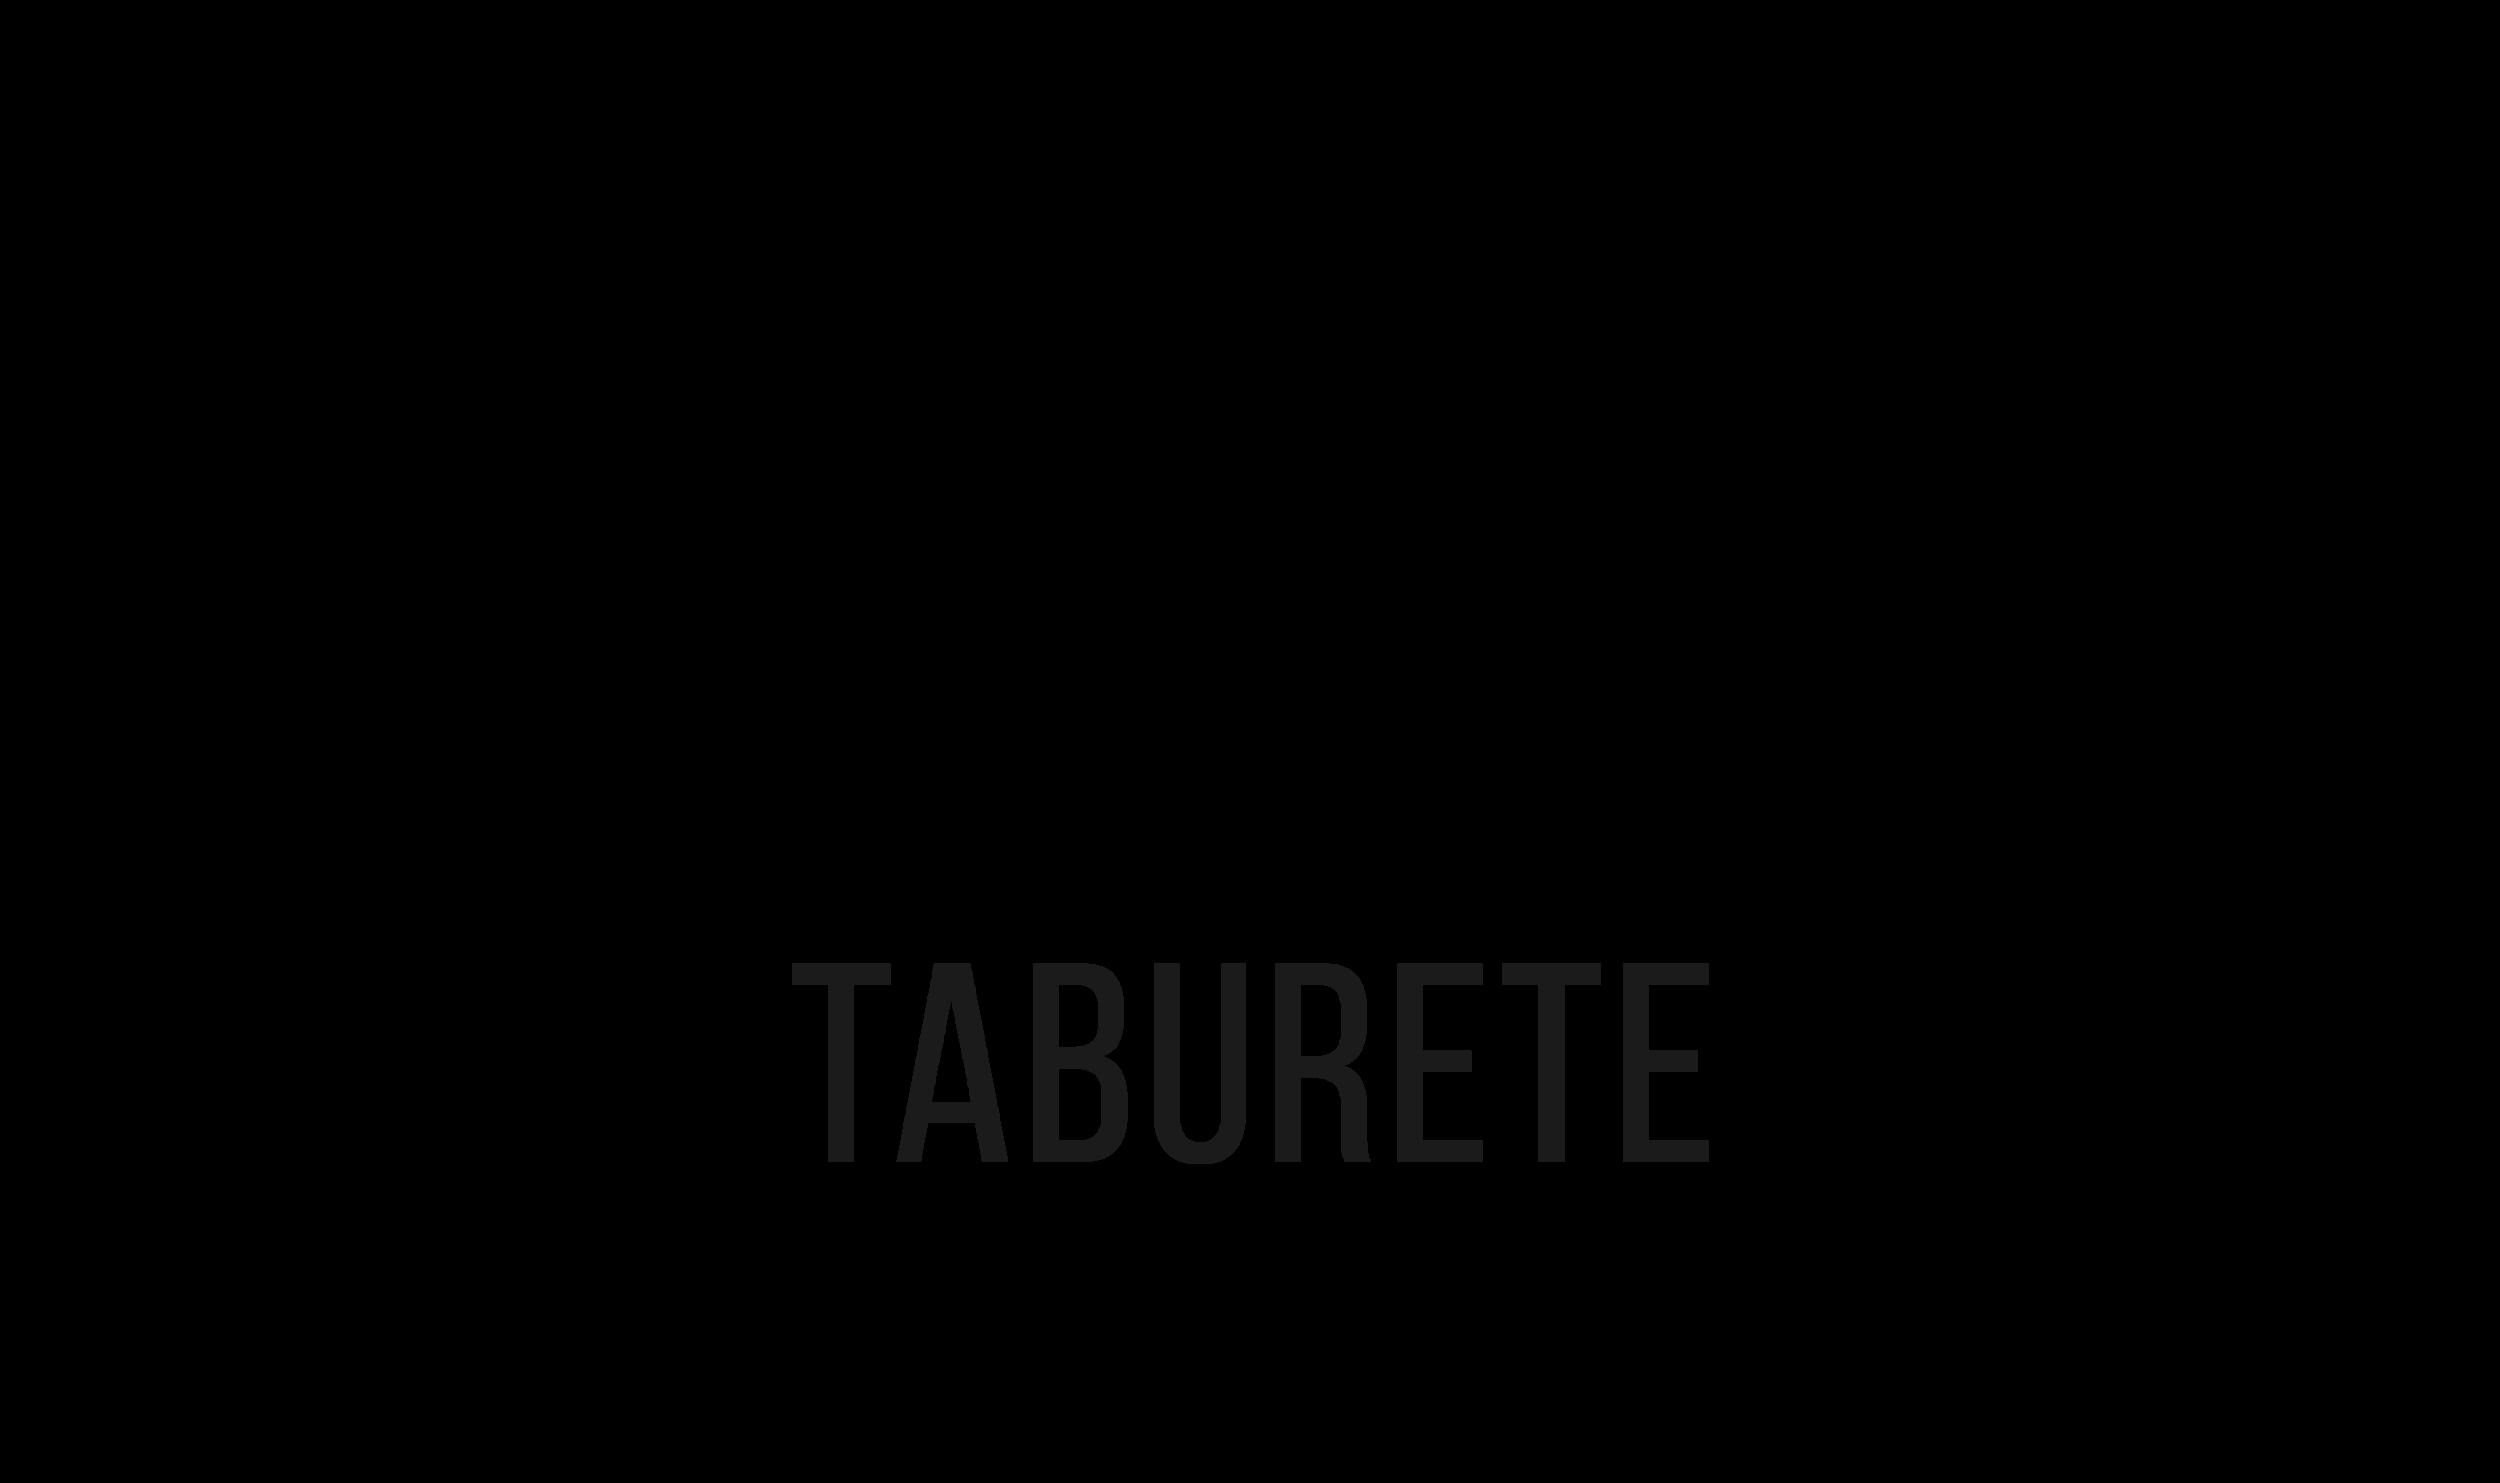 Logo Taburete-01.png